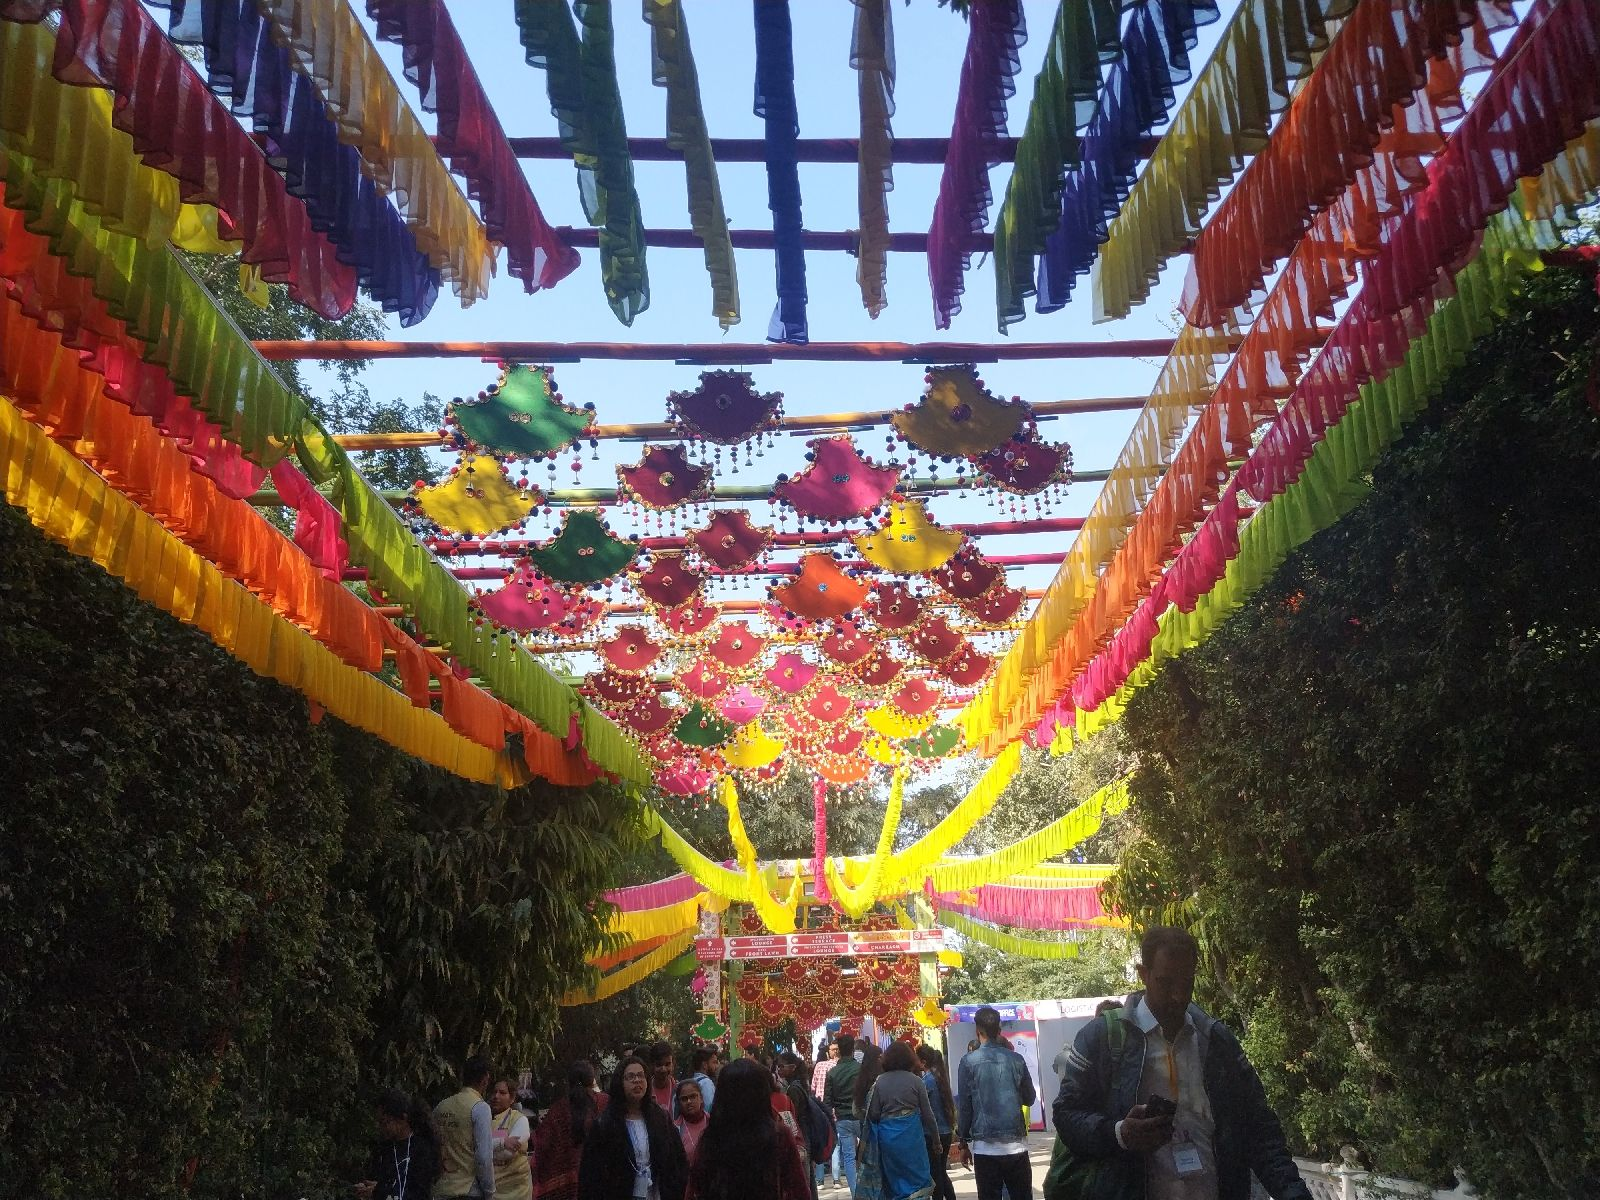 7 Beautiful Pictures Of Jaipur Rajasthan In 2020 Jaipur Rajasthan Things To Do